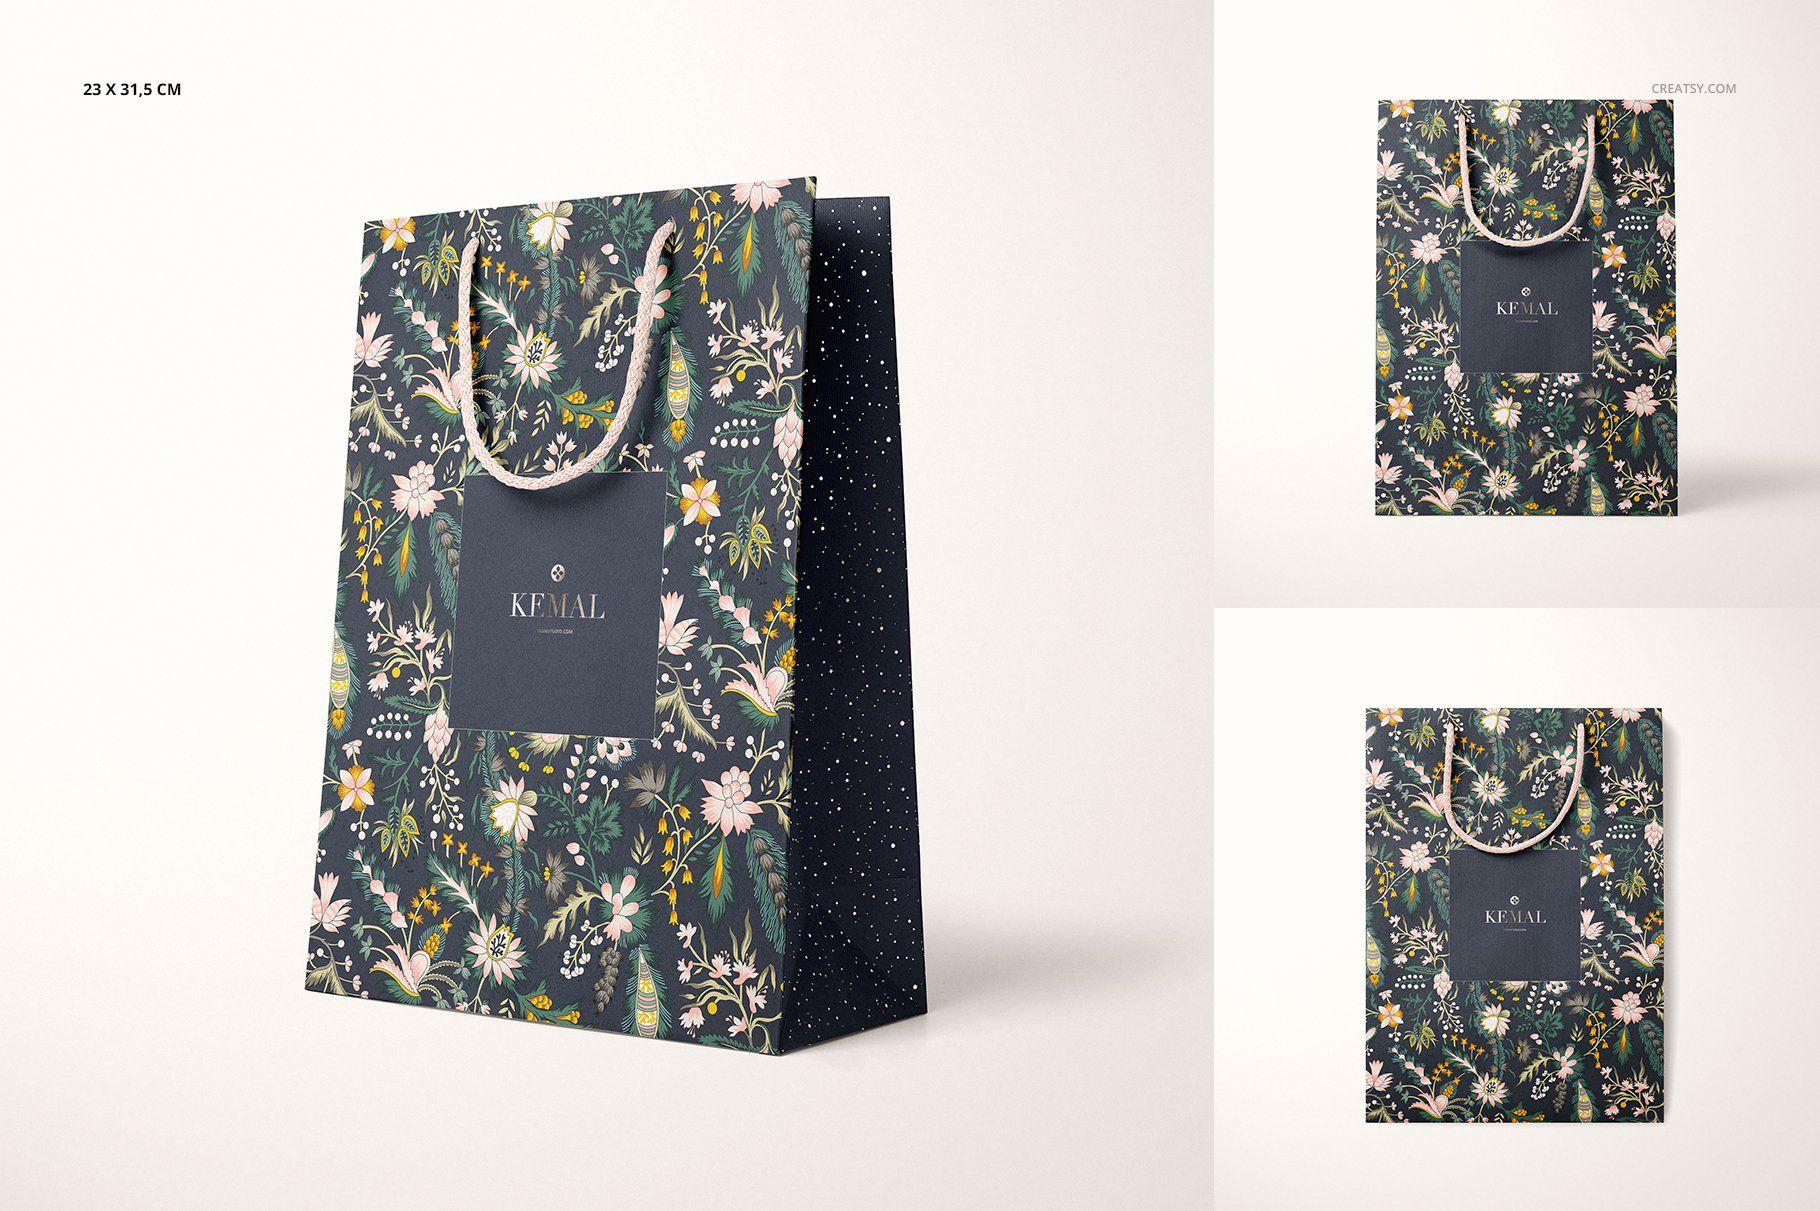 Download Paper Bags Mockup Set Bag Mockup Packaging Template Foil Stamping